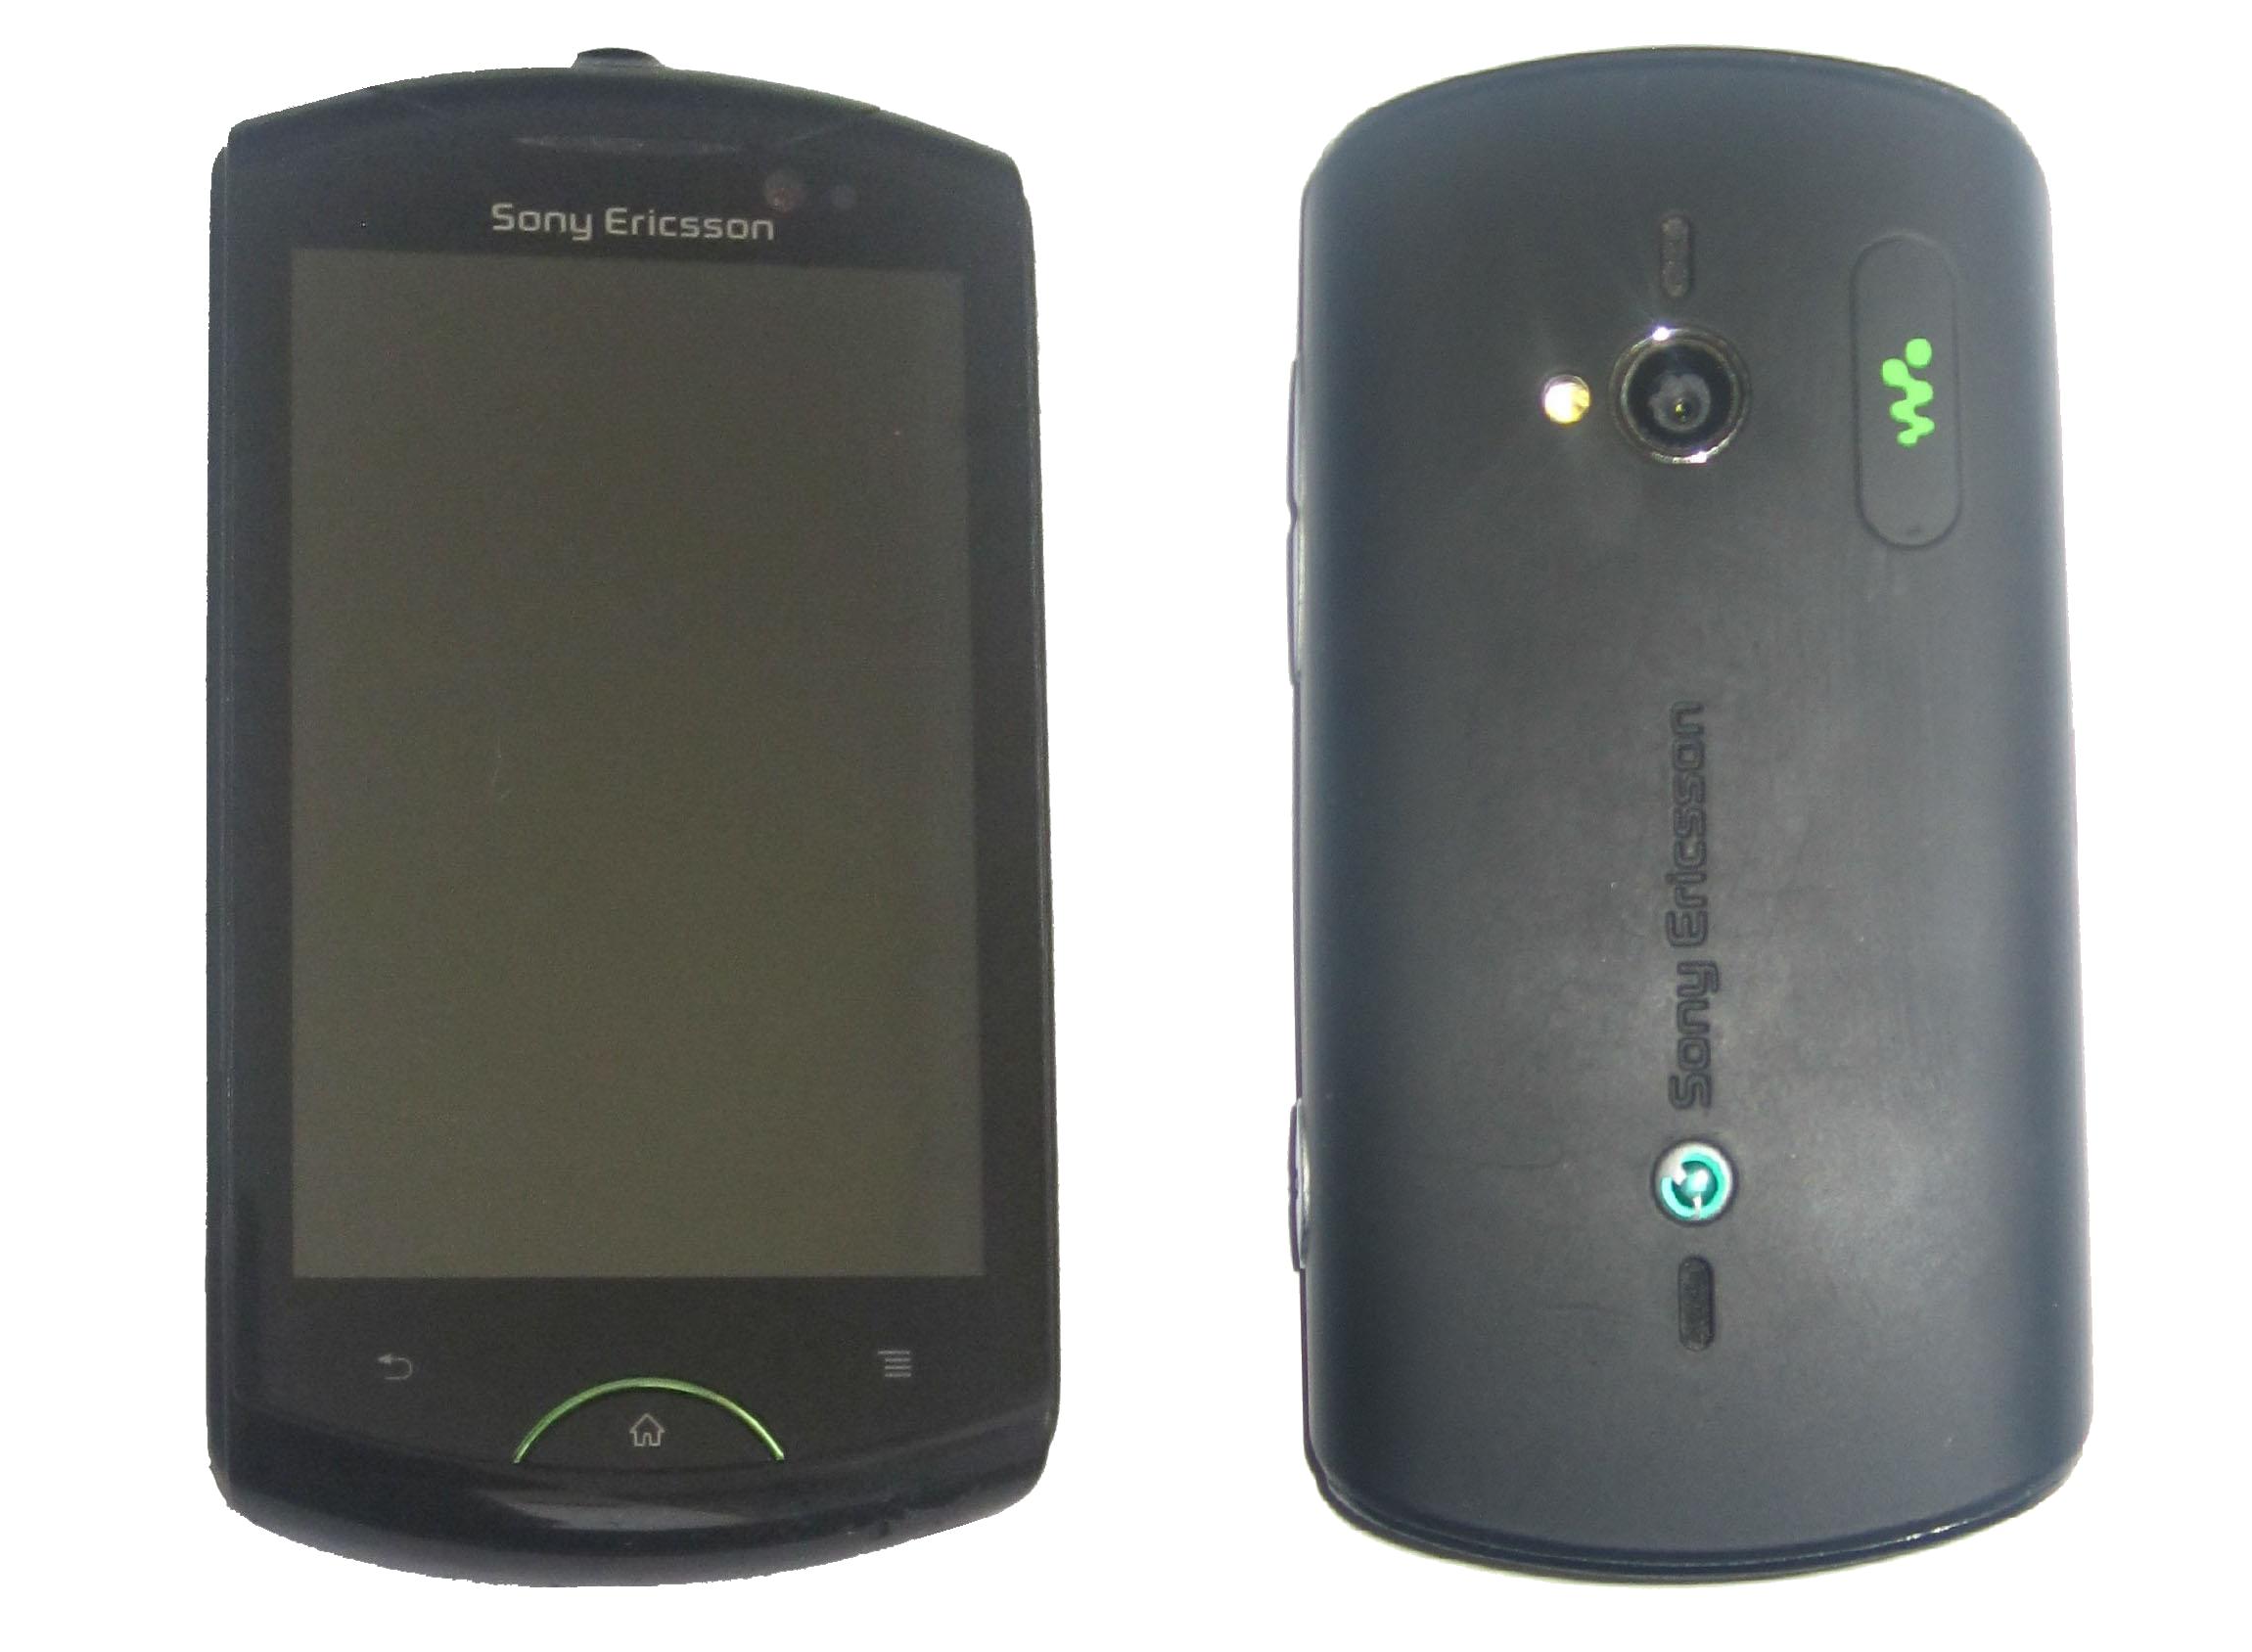 sony ericsson live with walkman wikiwand rh wikiwand com Sony Ericsson Walkman AT&T Sony Ericsson Walkman AT&T